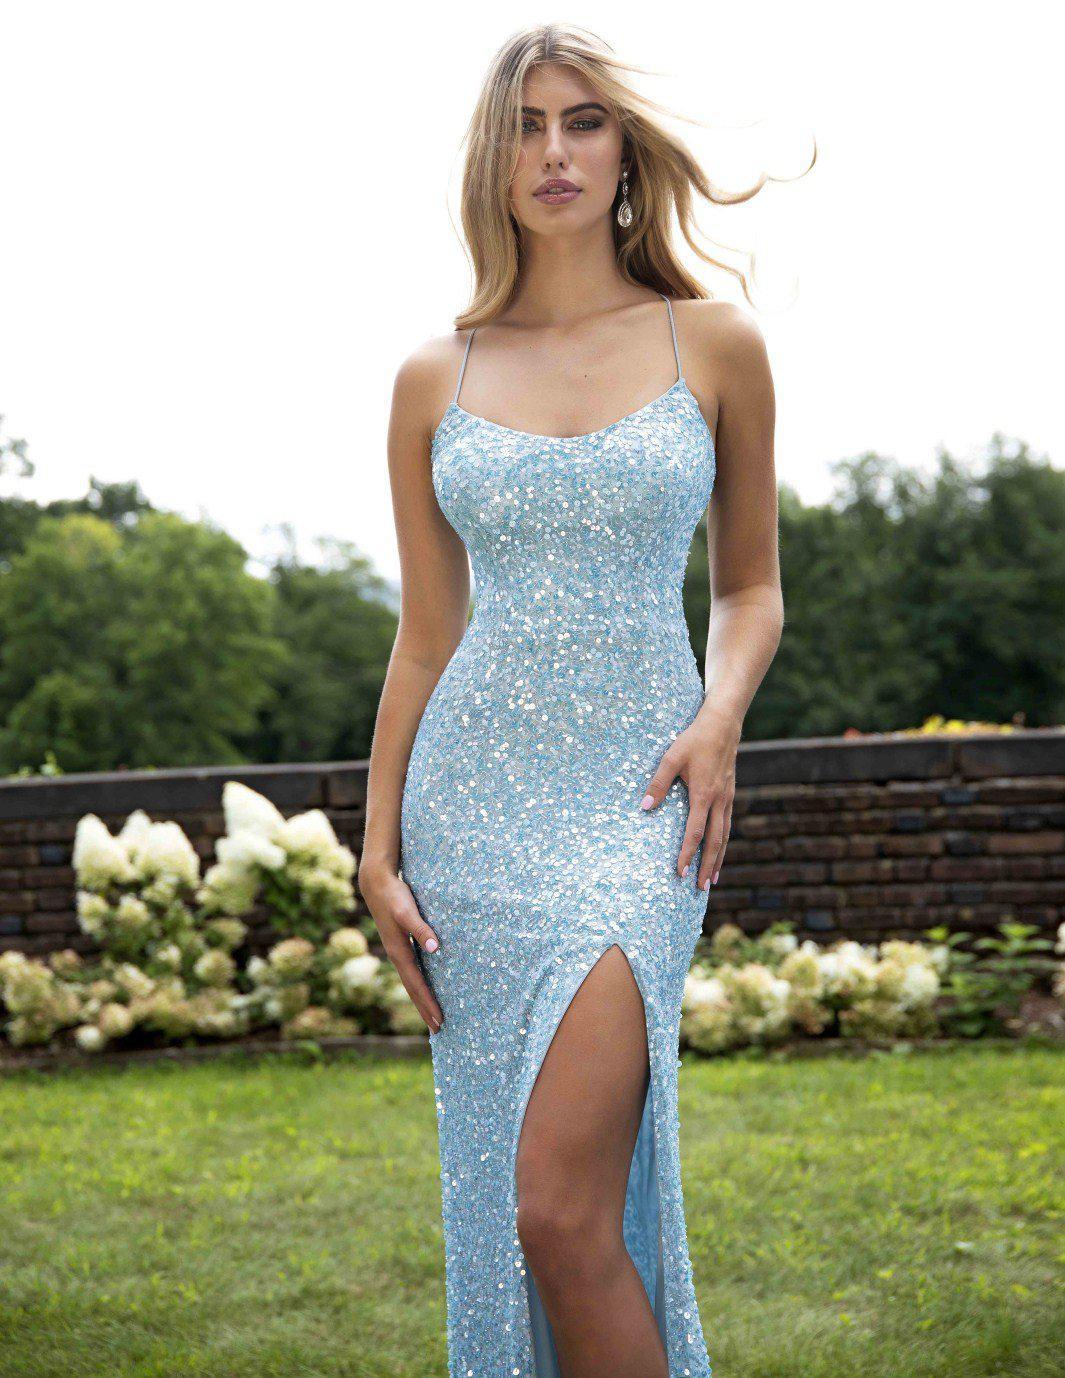 f4d5814224 Primavera Couture 3290 Allover Sequin Sexy Back Sheath Gown in Blue ...